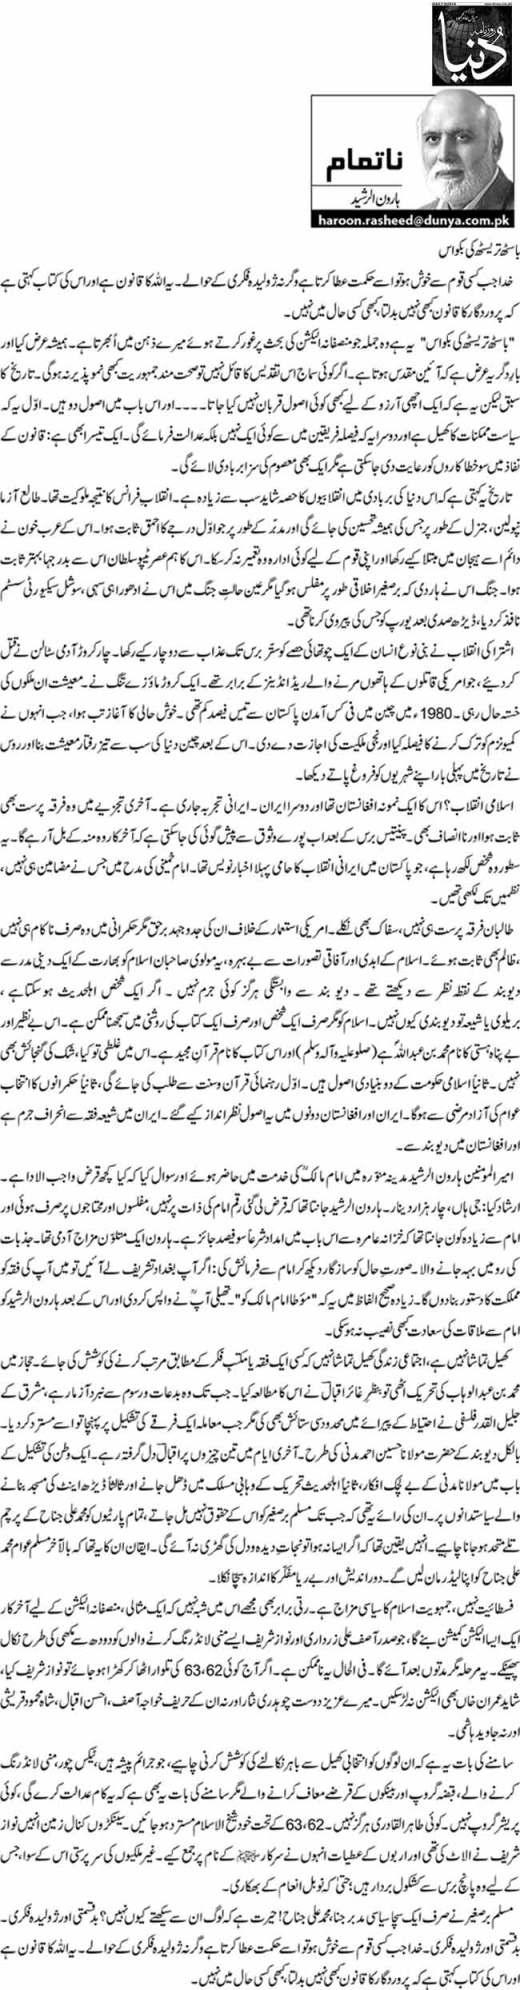 62,63 ki bakwas - Haroon-ur-Rasheed